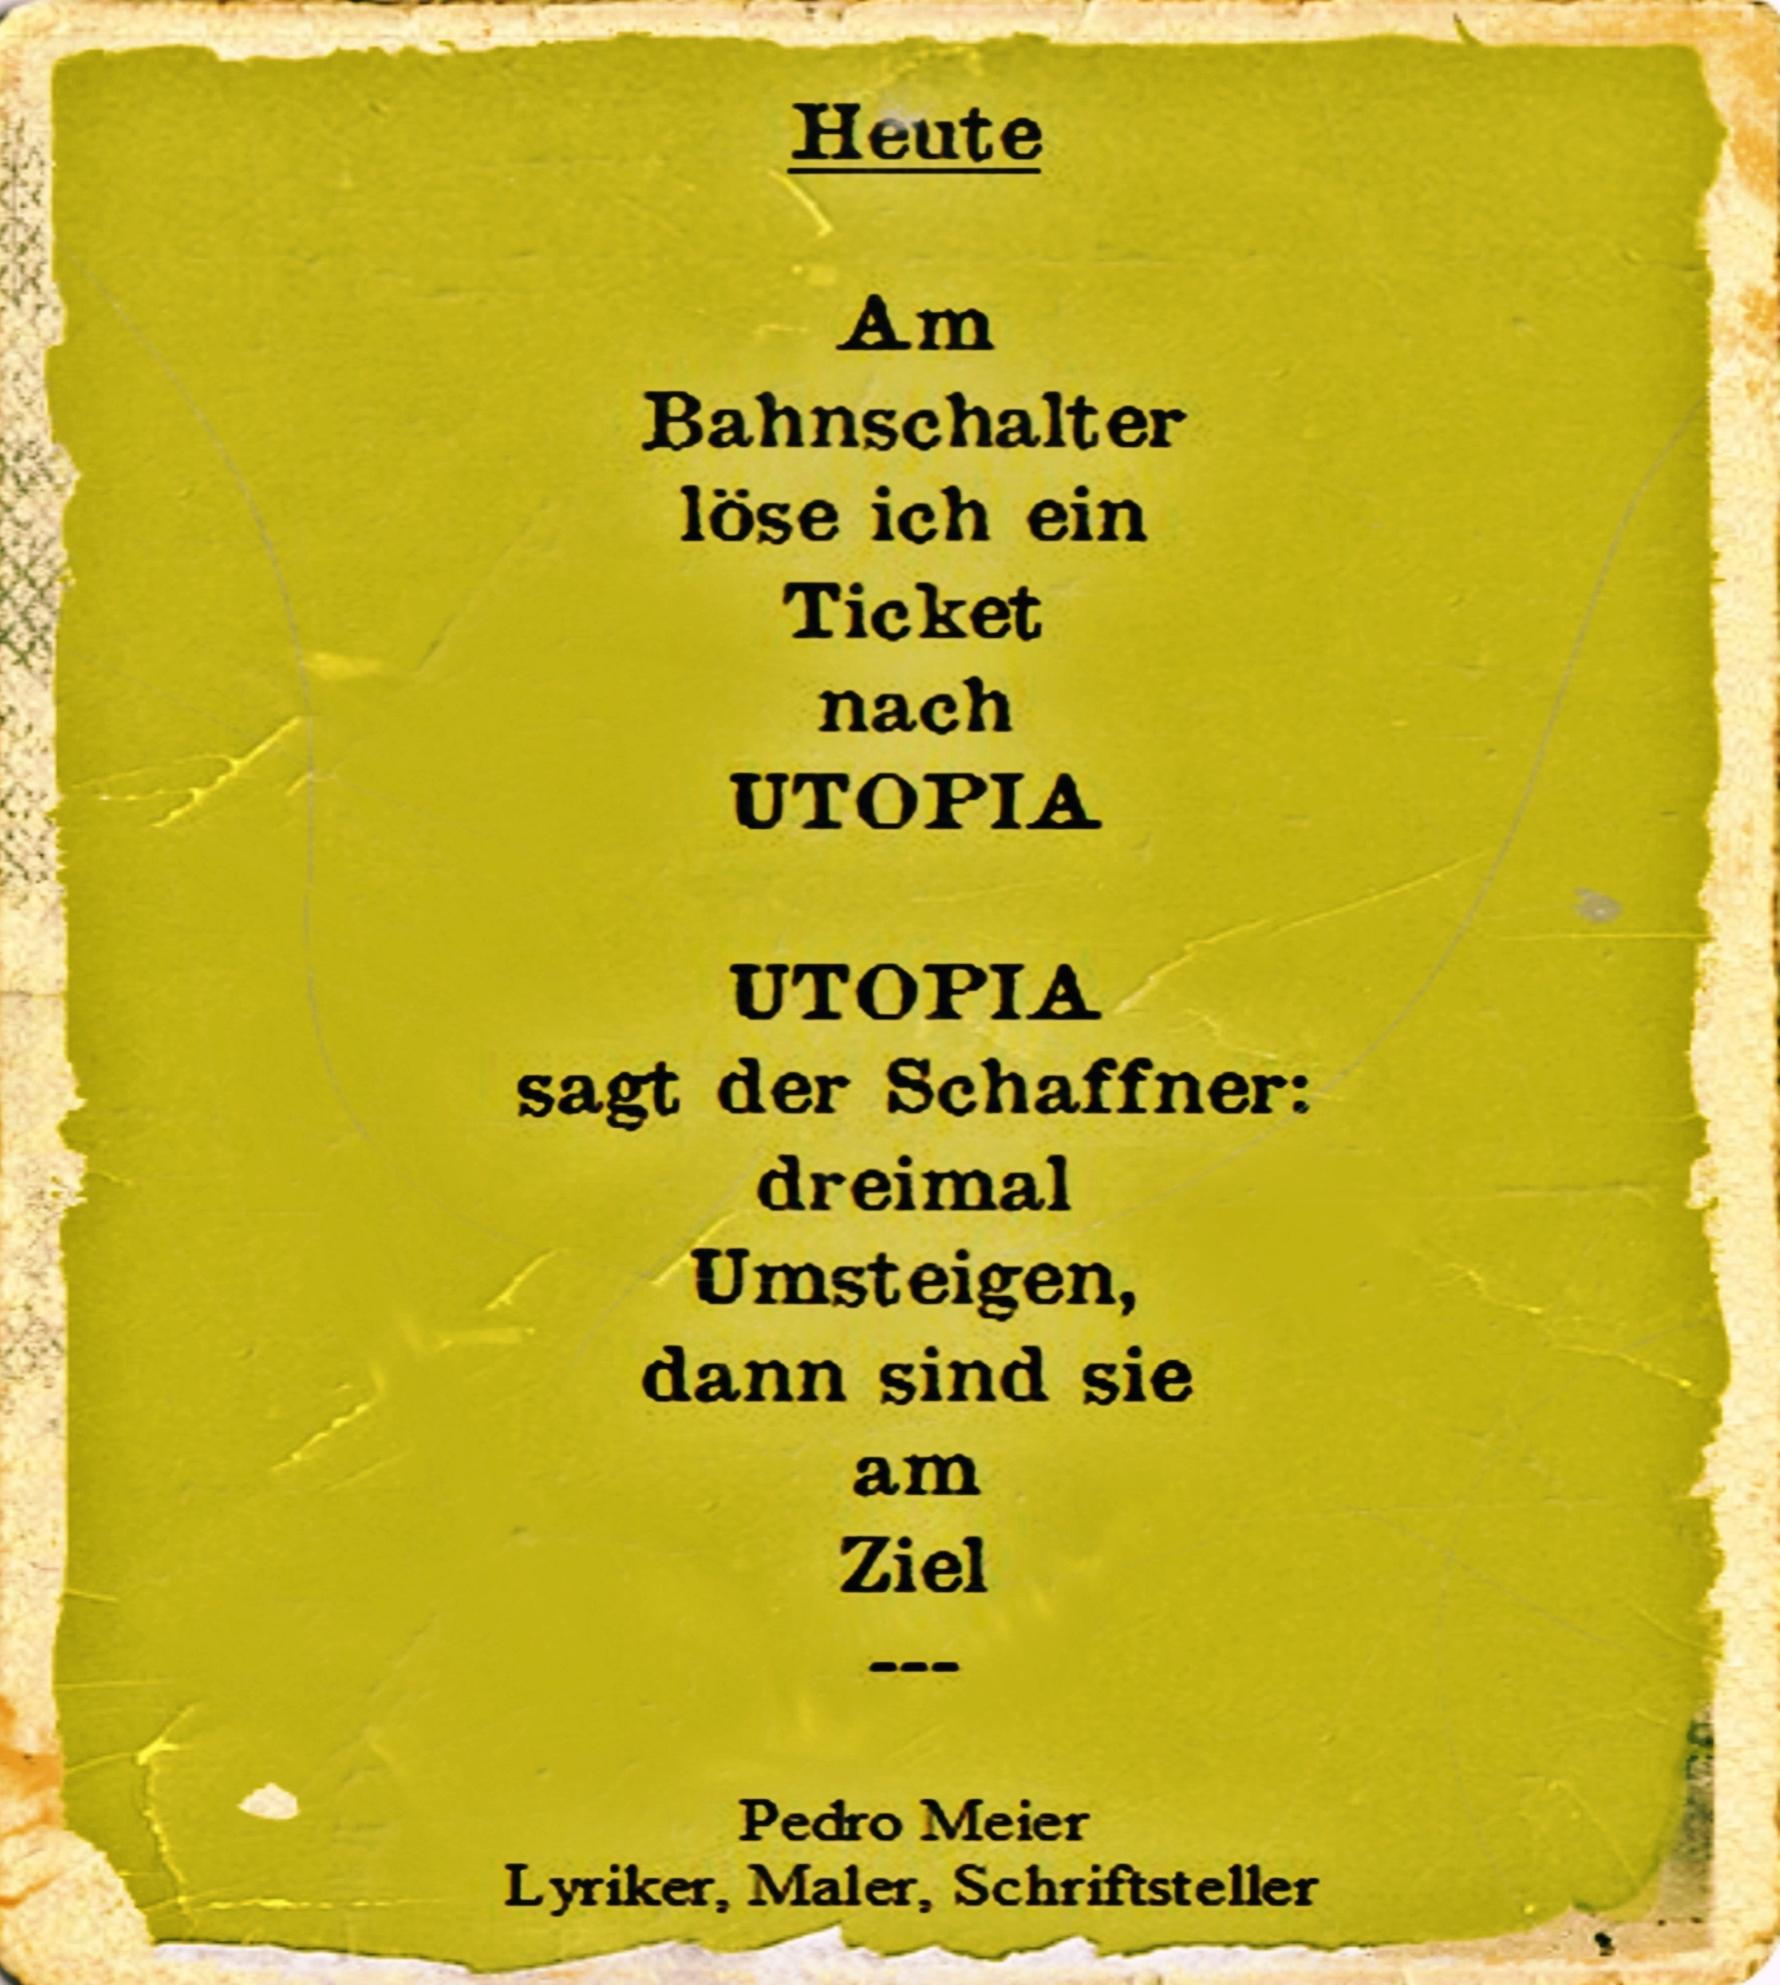 Pedro Meier Schriftsteller 6 Gedichte Berliner Polaroids